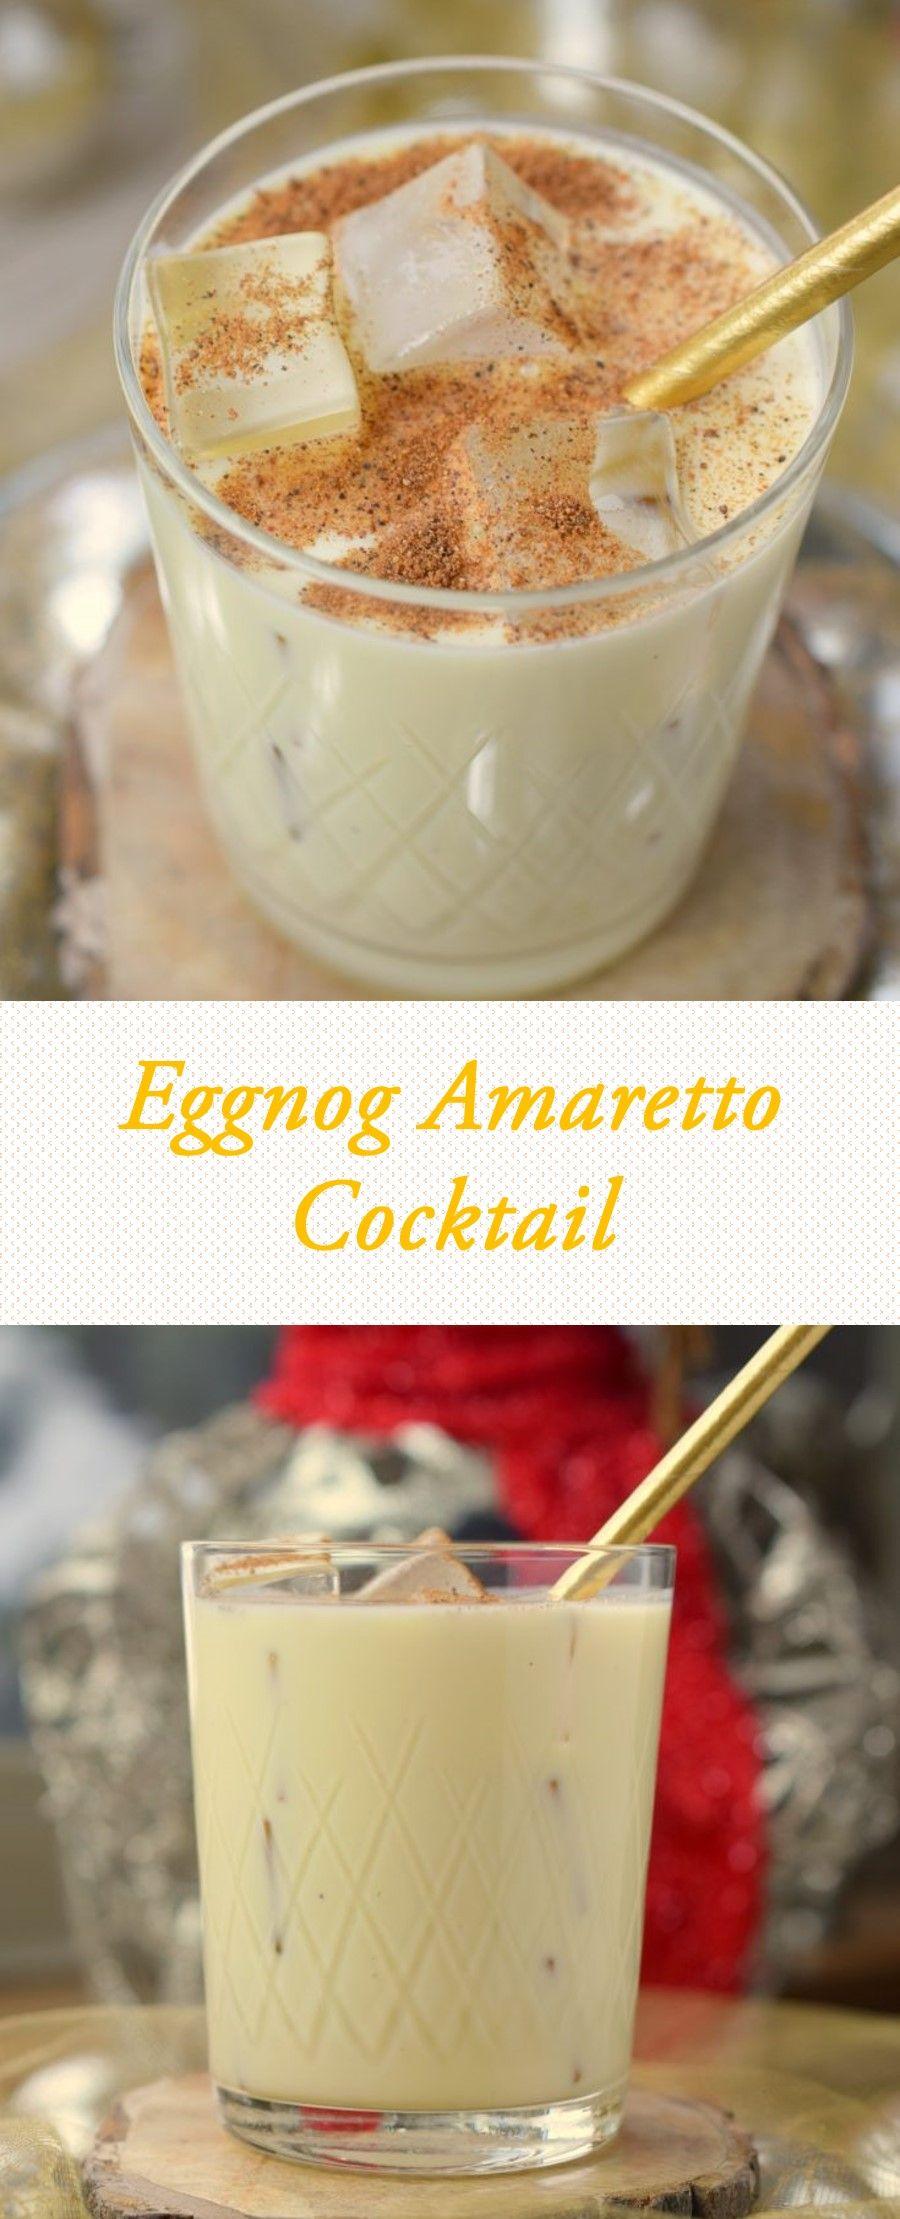 Eggnog Amaretto Cocktail | Eggnog drinks Drinks alcohol ...